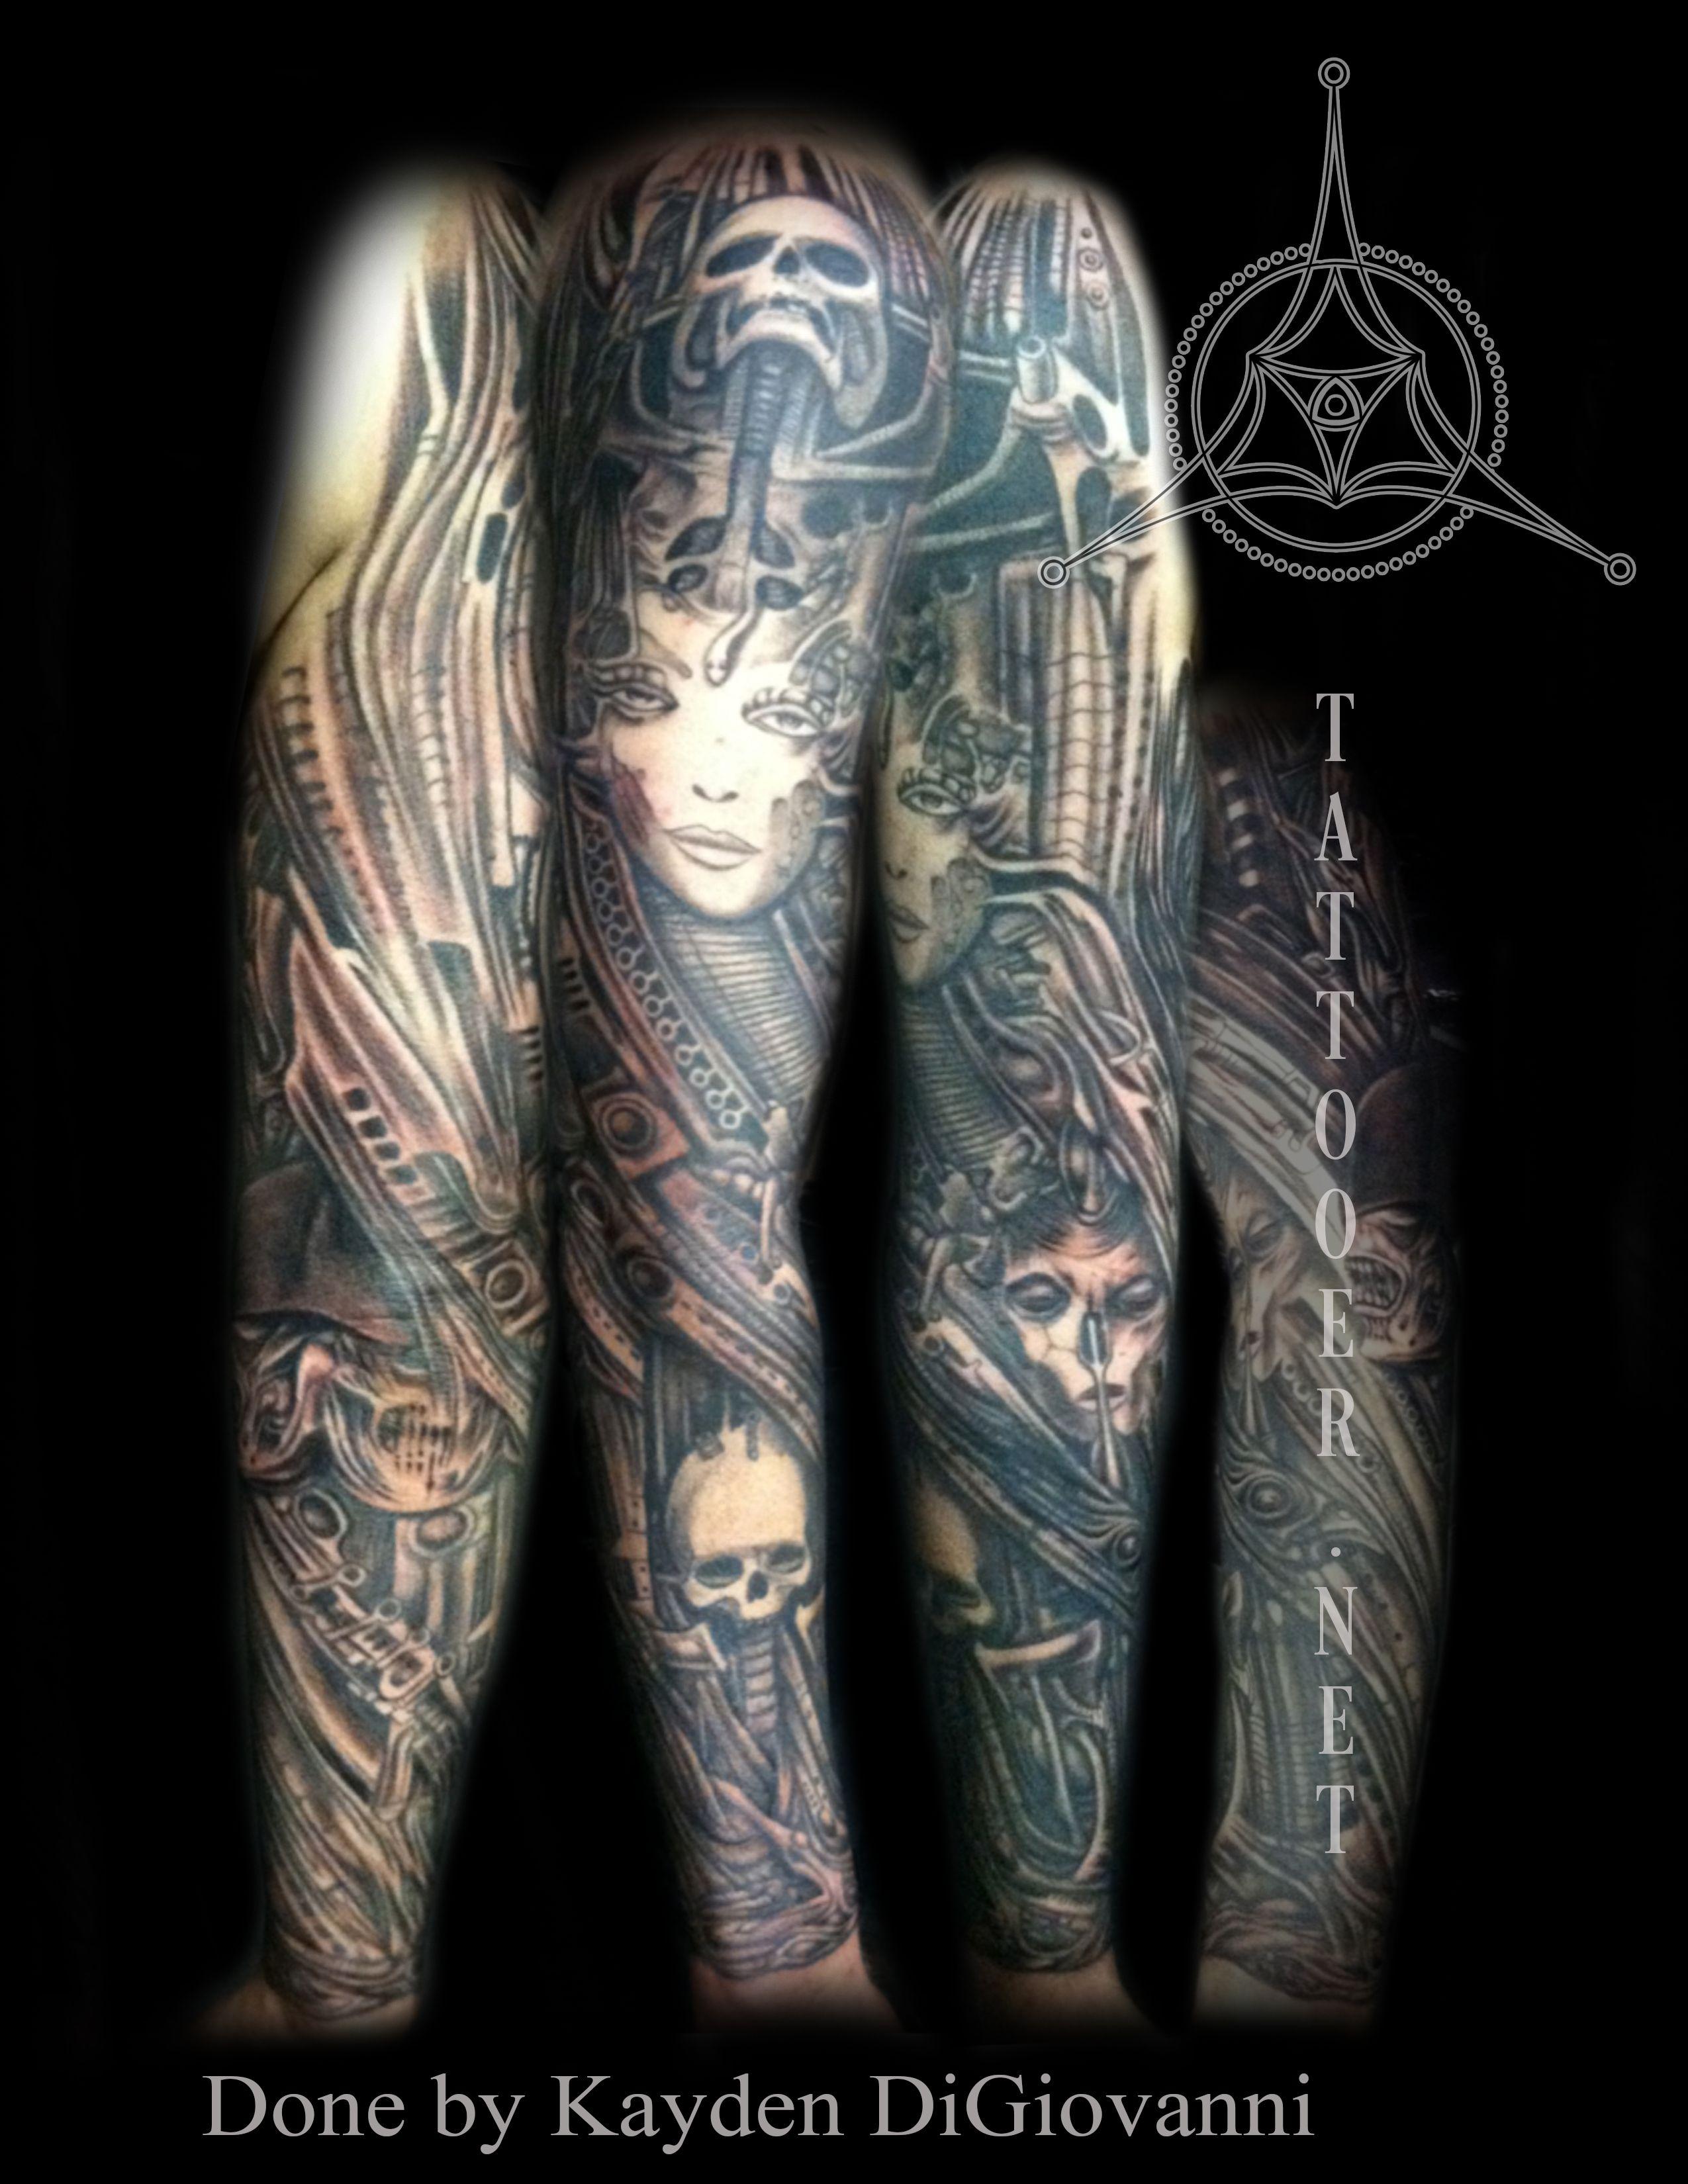 Pin By Dallas Tattoo On Dallas Tattoo Dallas Tattoo Best Tattoo Shops Tattoo Shop